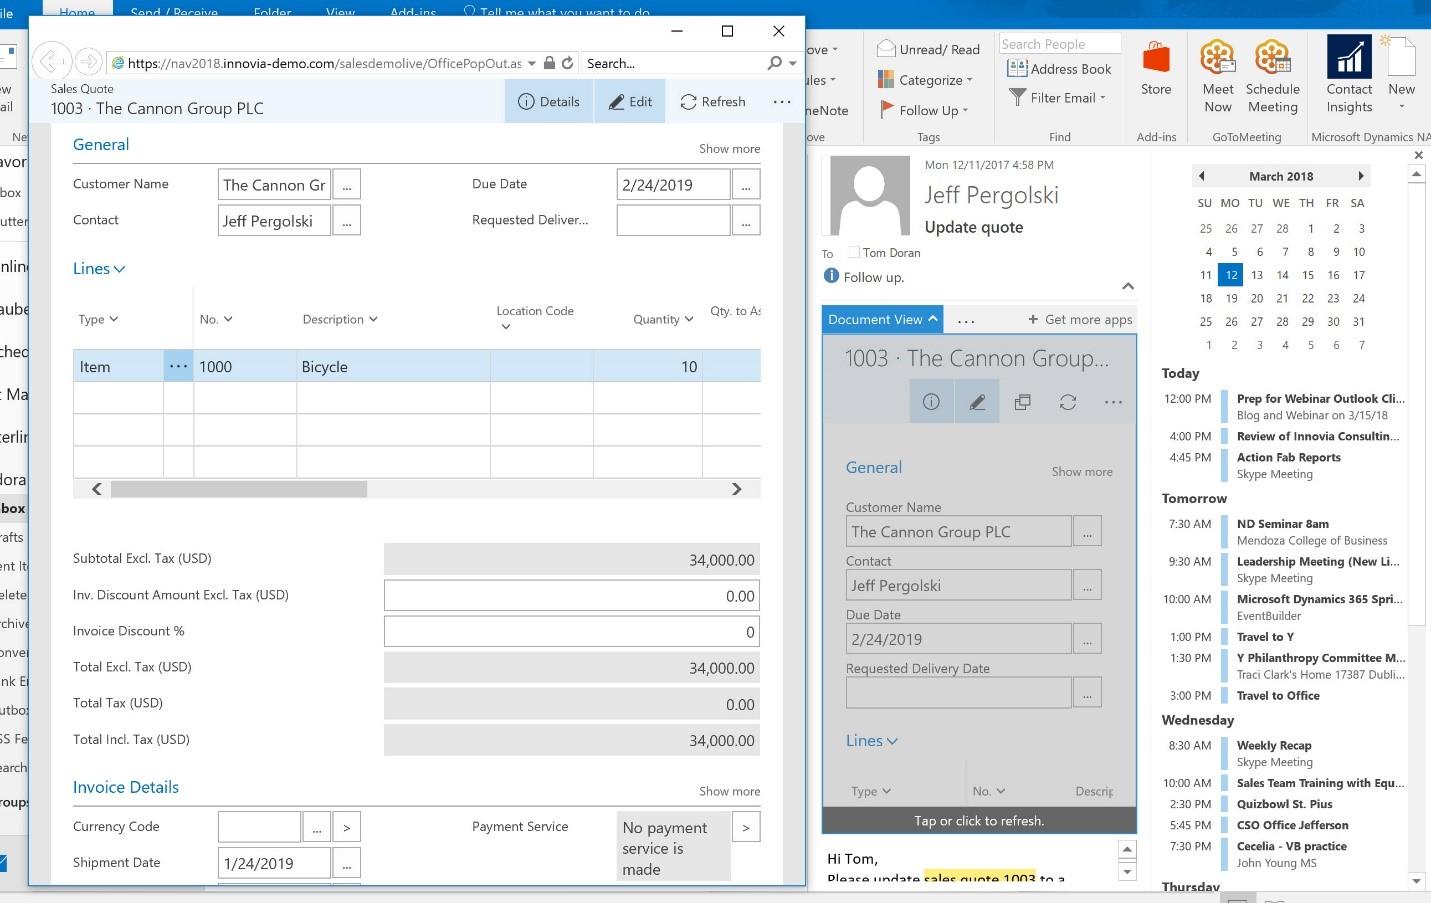 Innovia Outlook Client Image 3.jpg